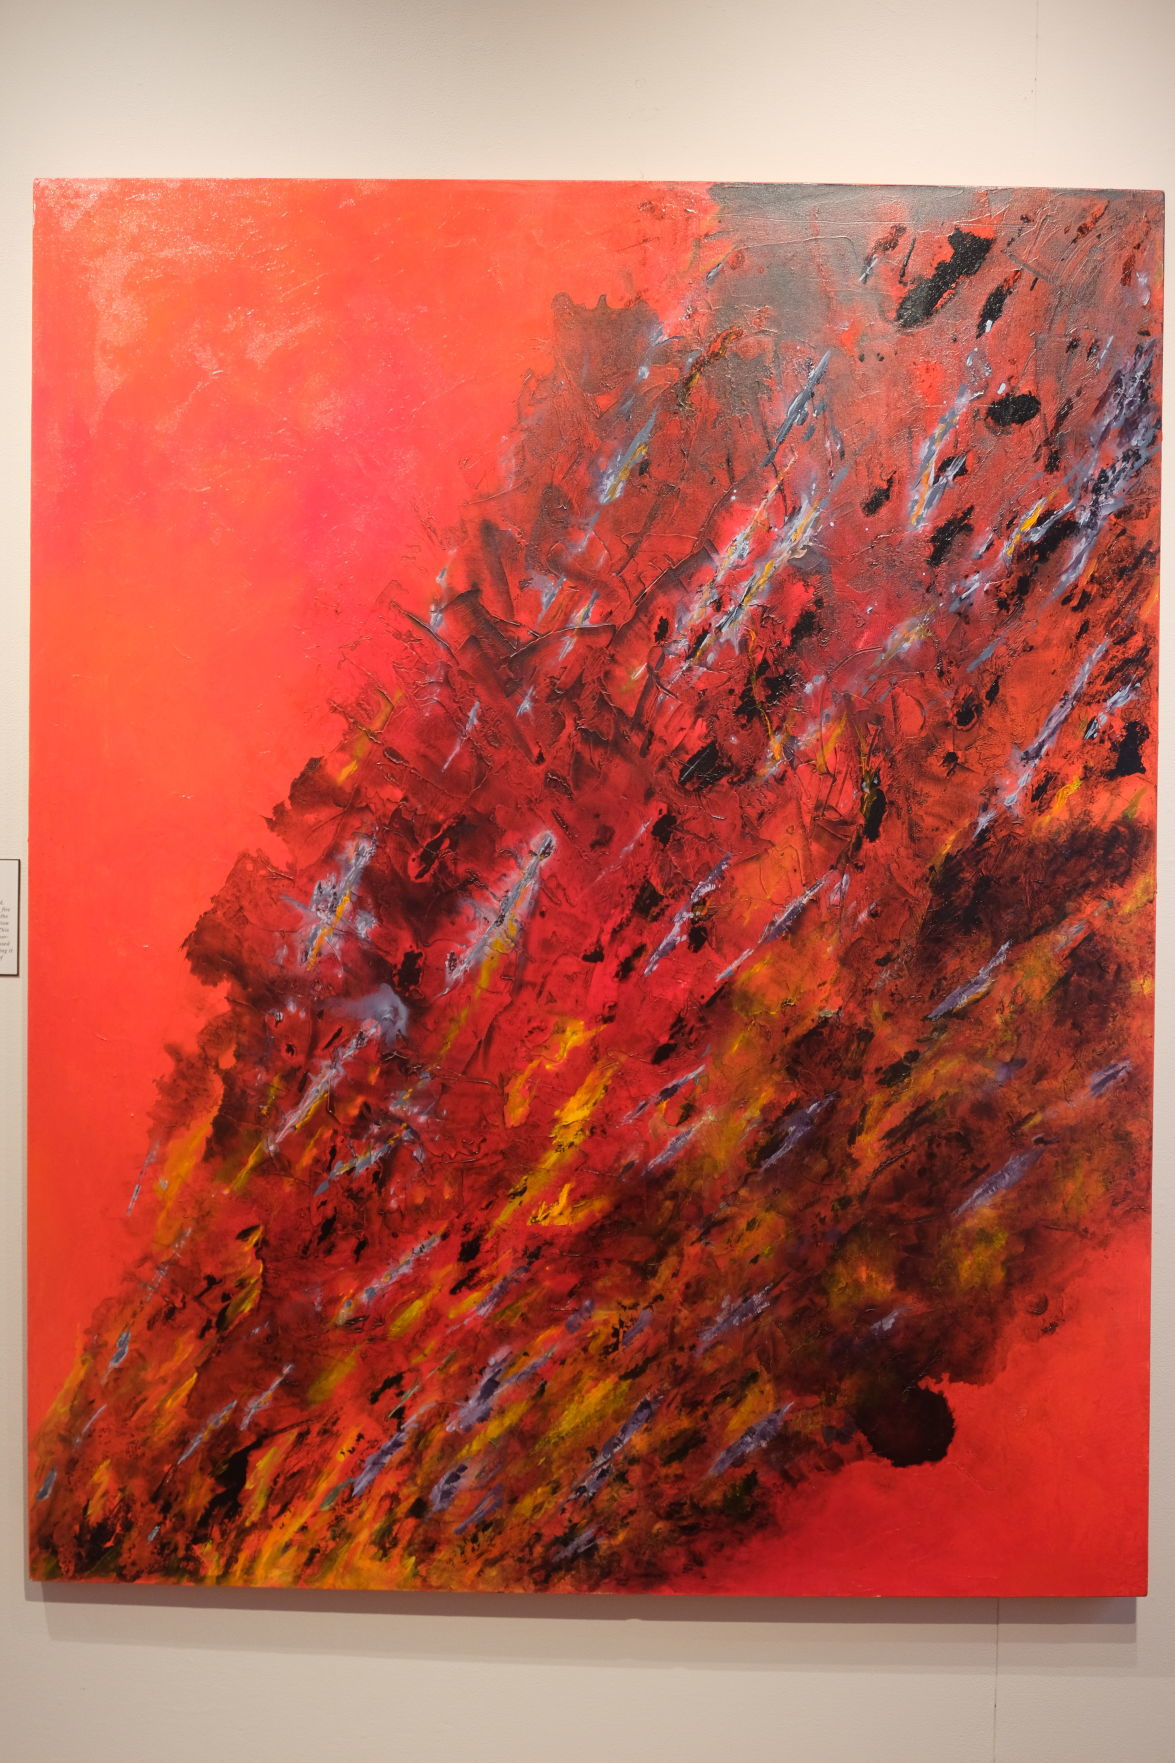 'Gehanna' by Susan Jespersen.